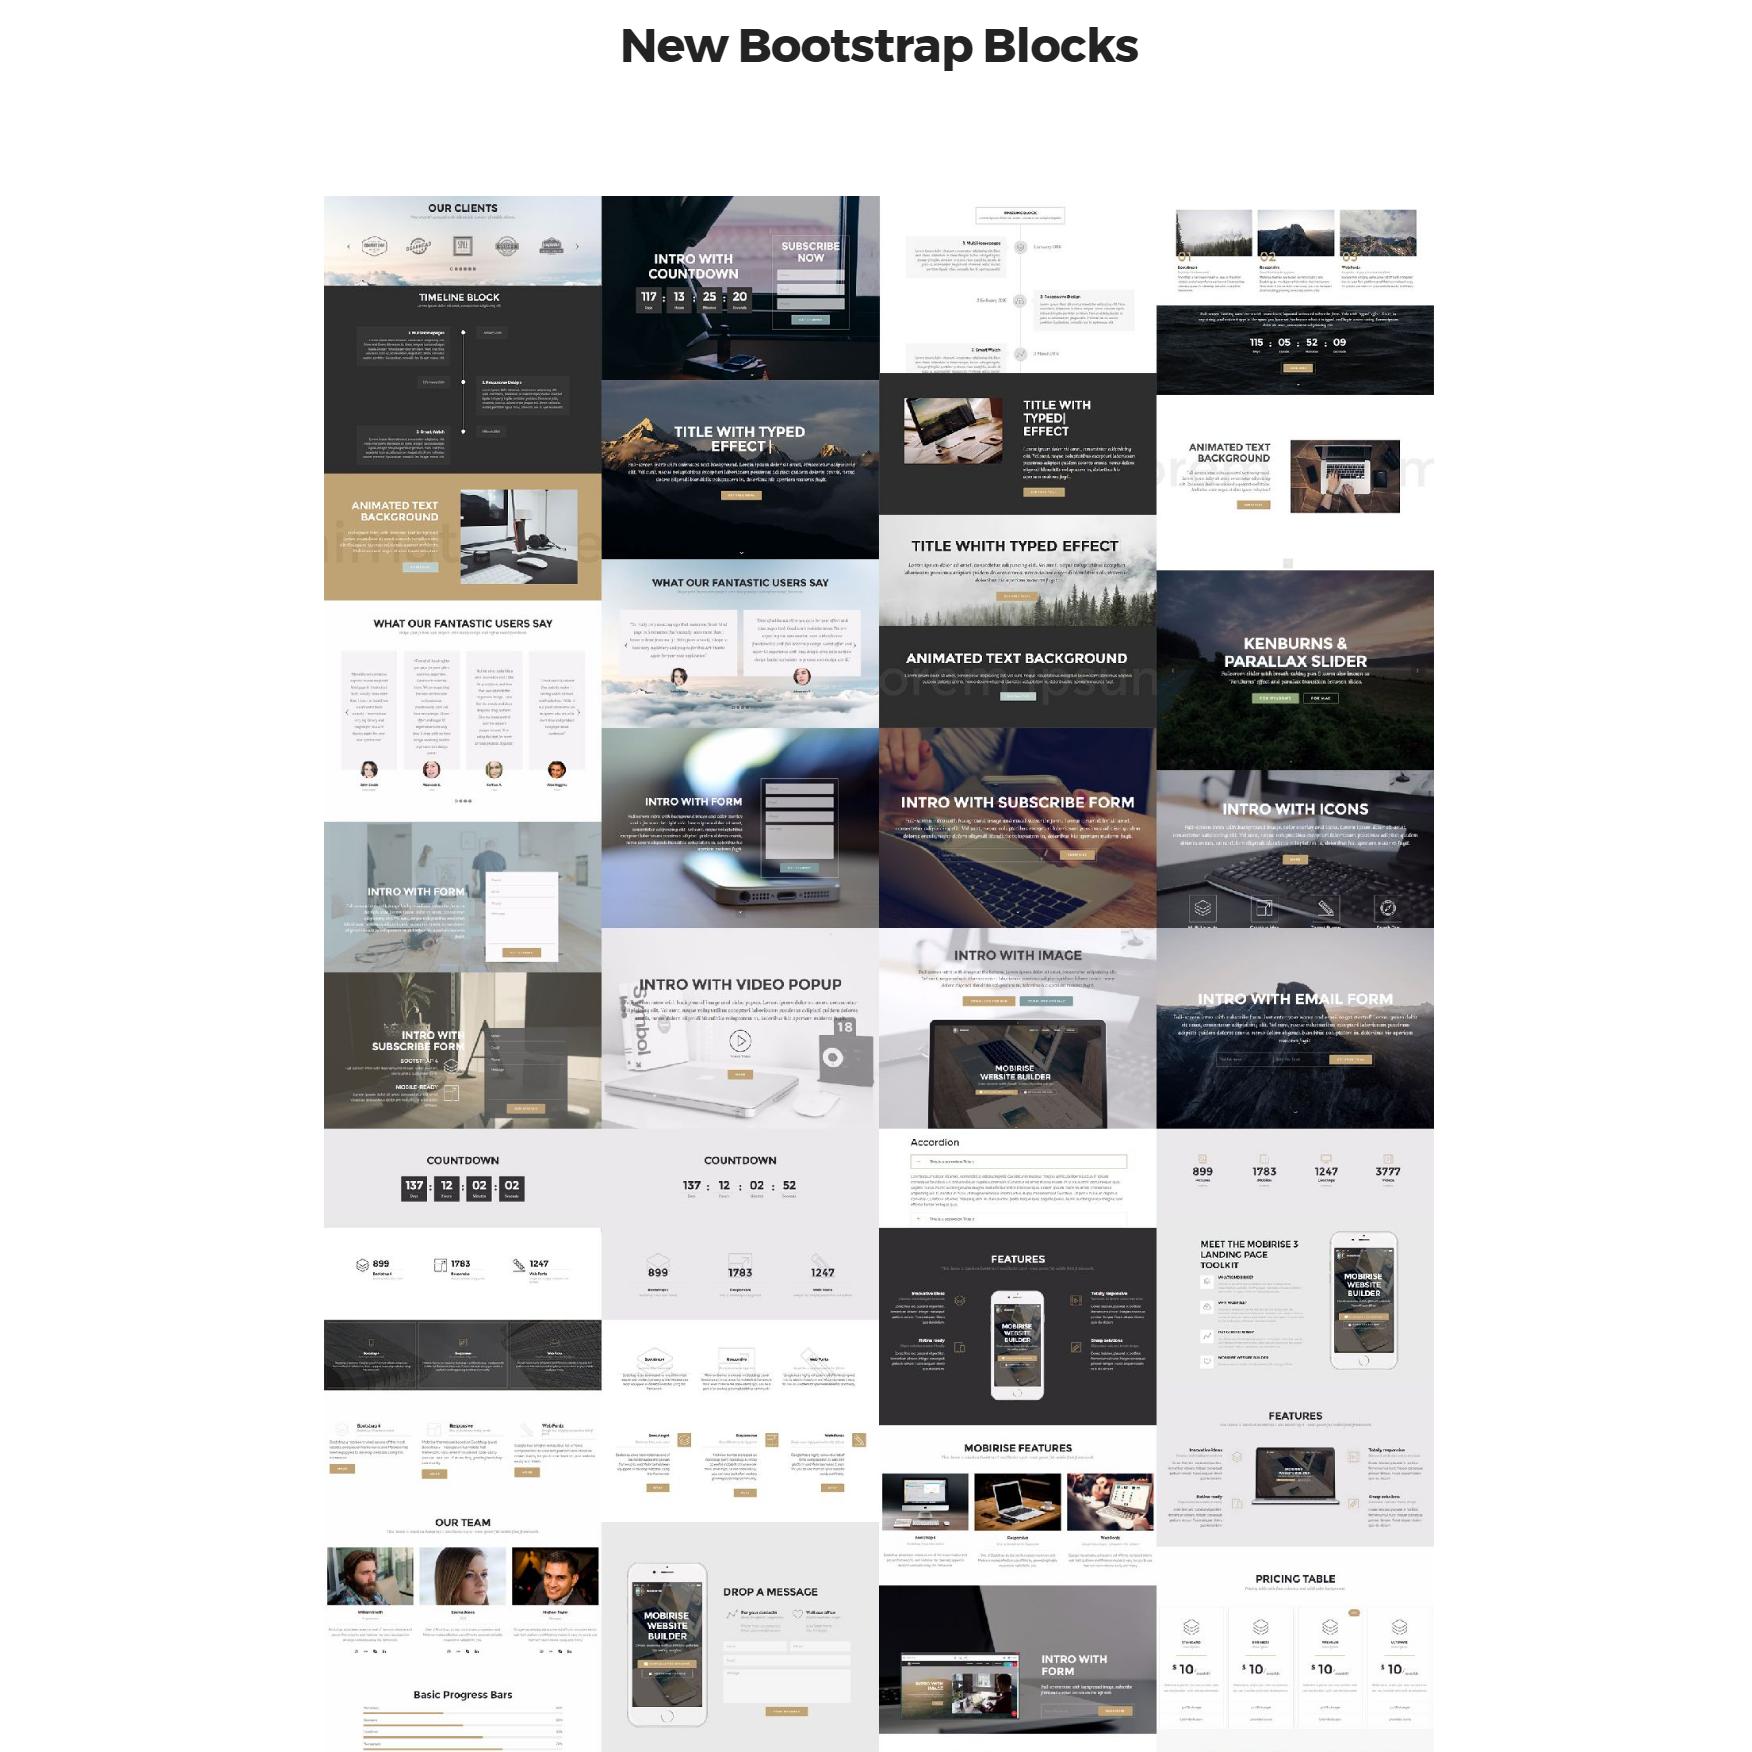 Responsive Bootstrap 4 mobile-friendly blocks Themes